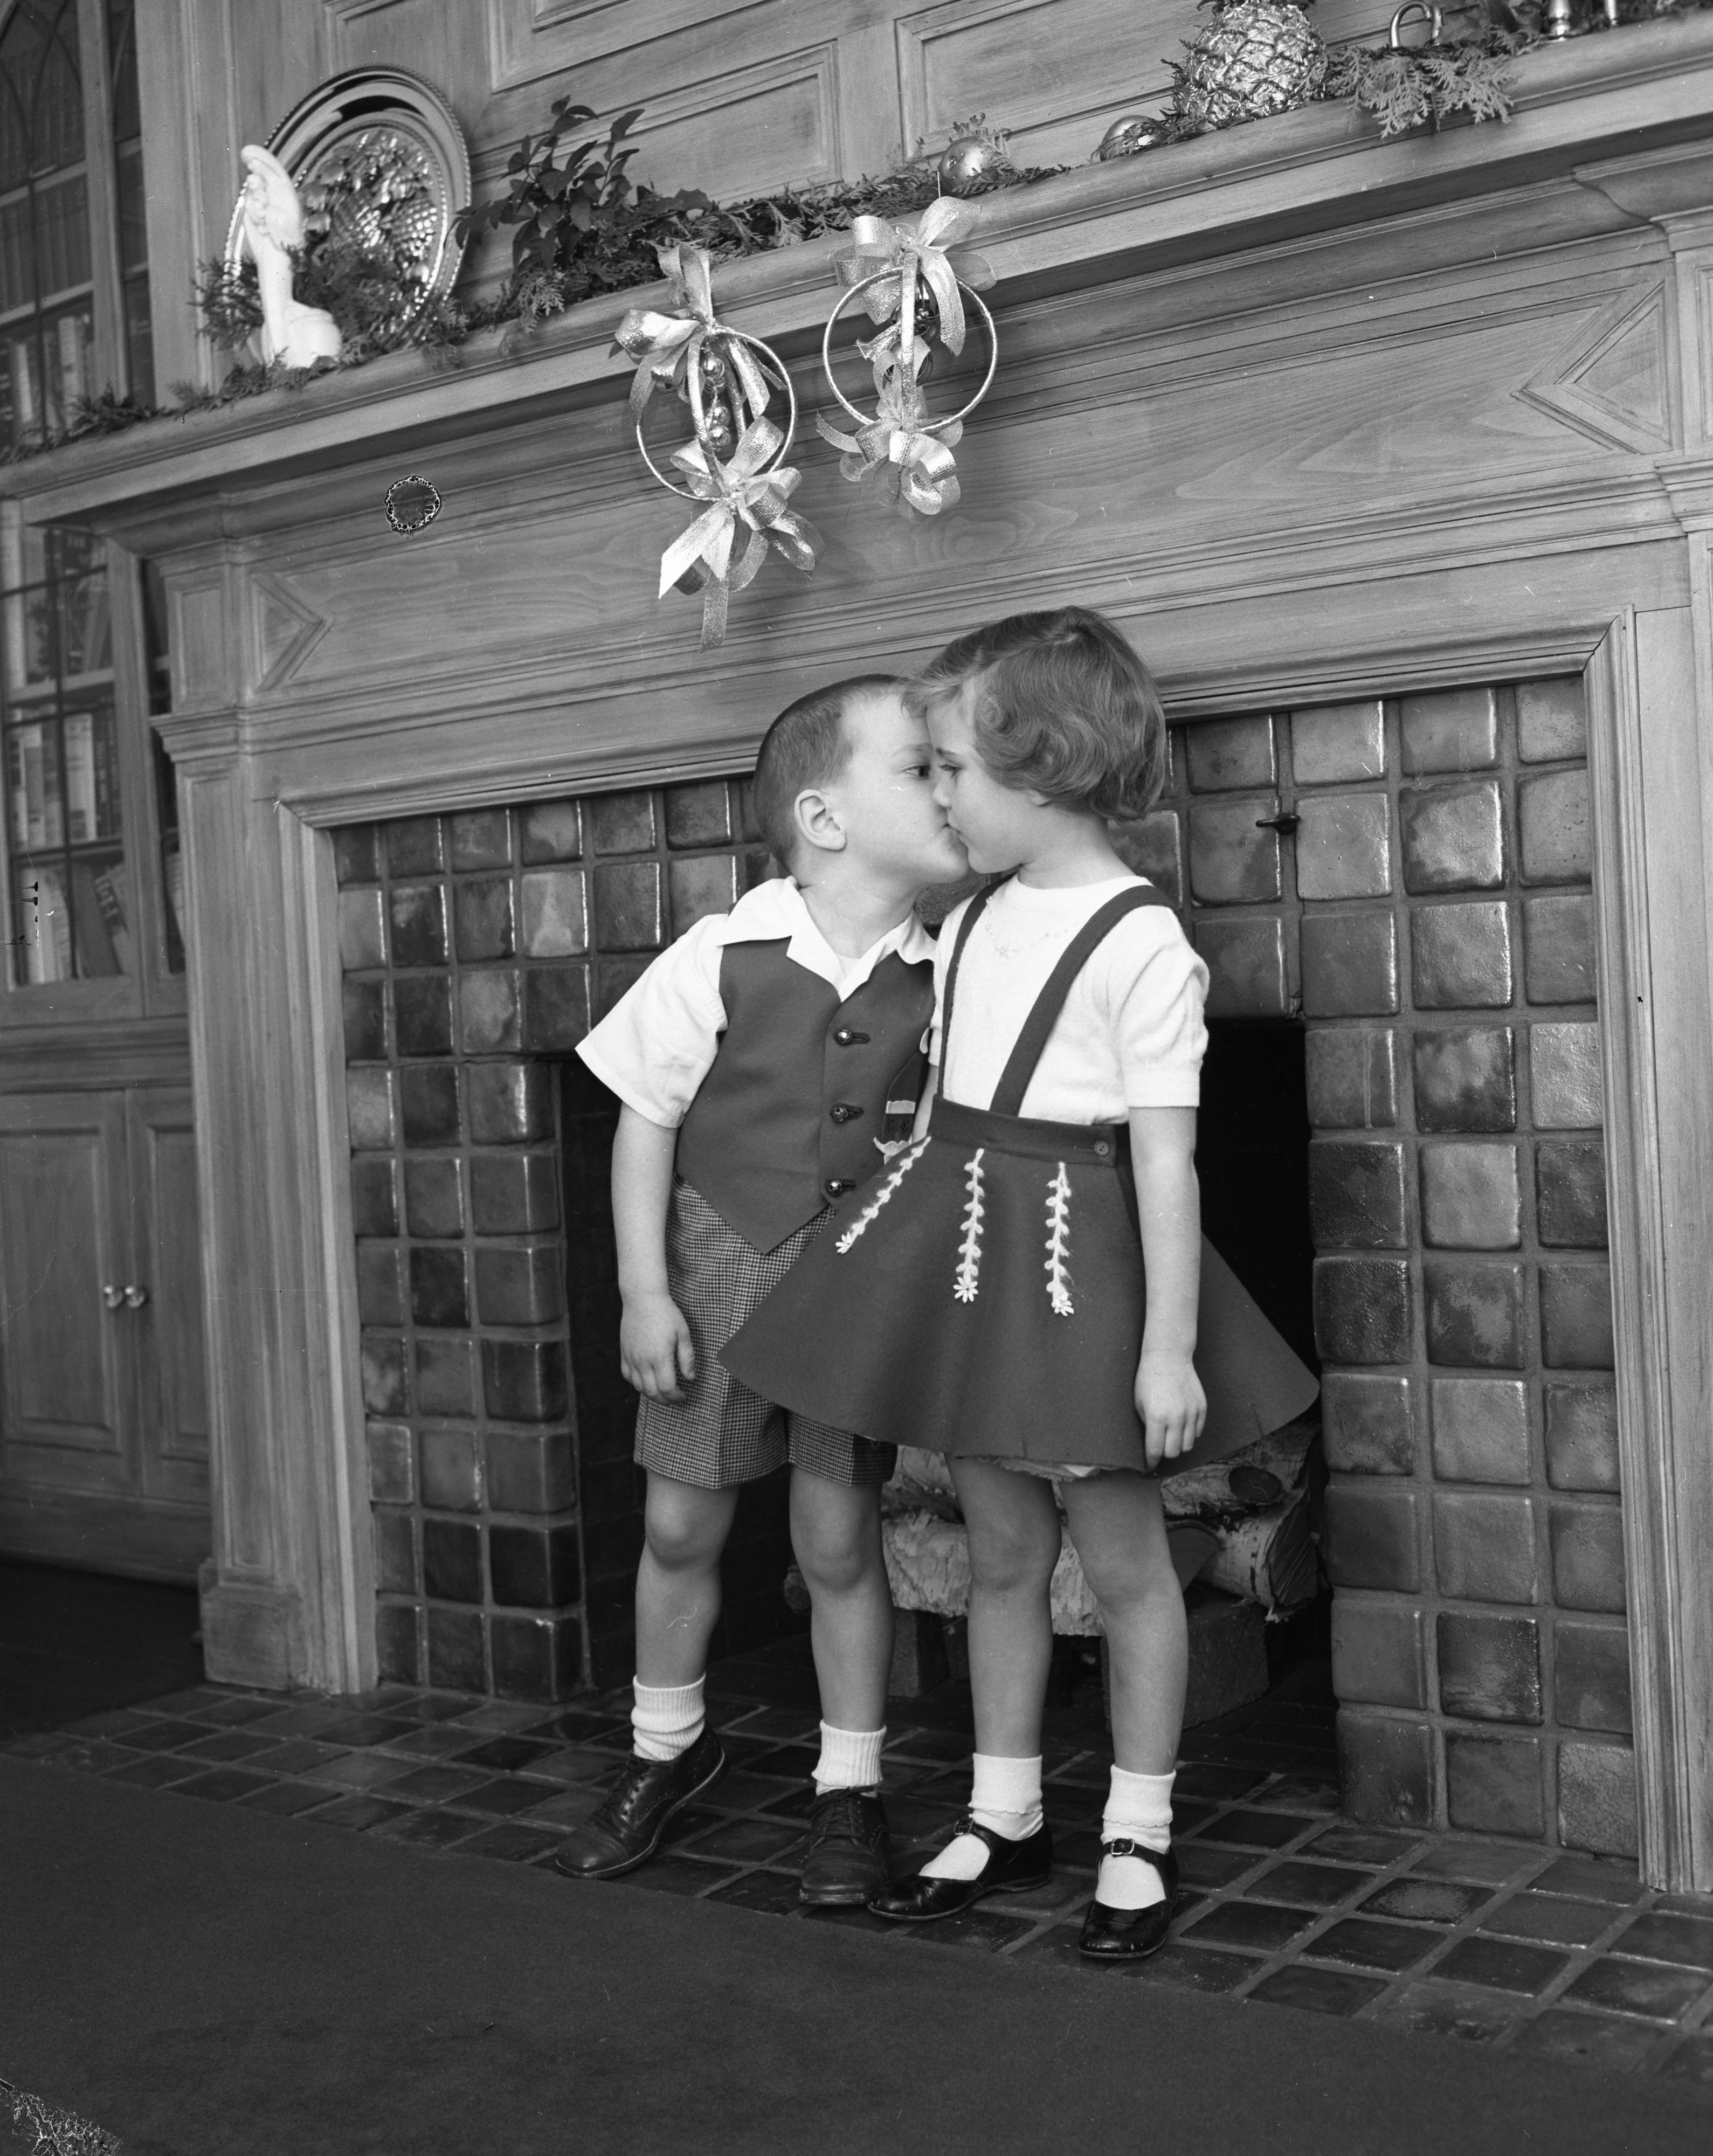 Charles Lighthall and Ann DeVine kiss under Christmas bells ...